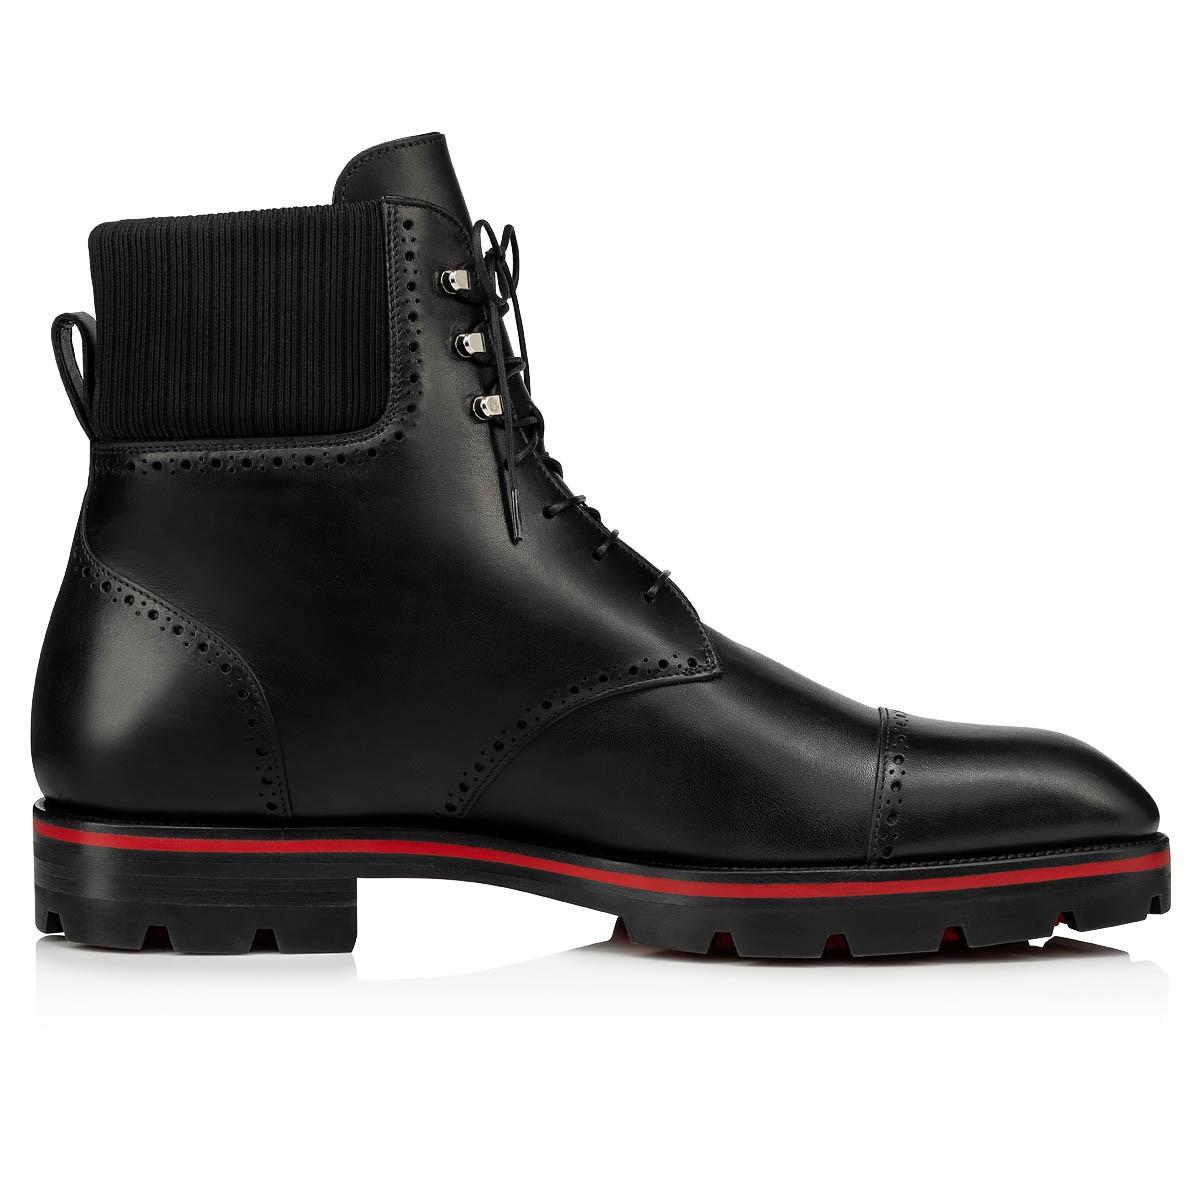 Men Shoes - Citycroc Flat - Christian Louboutin